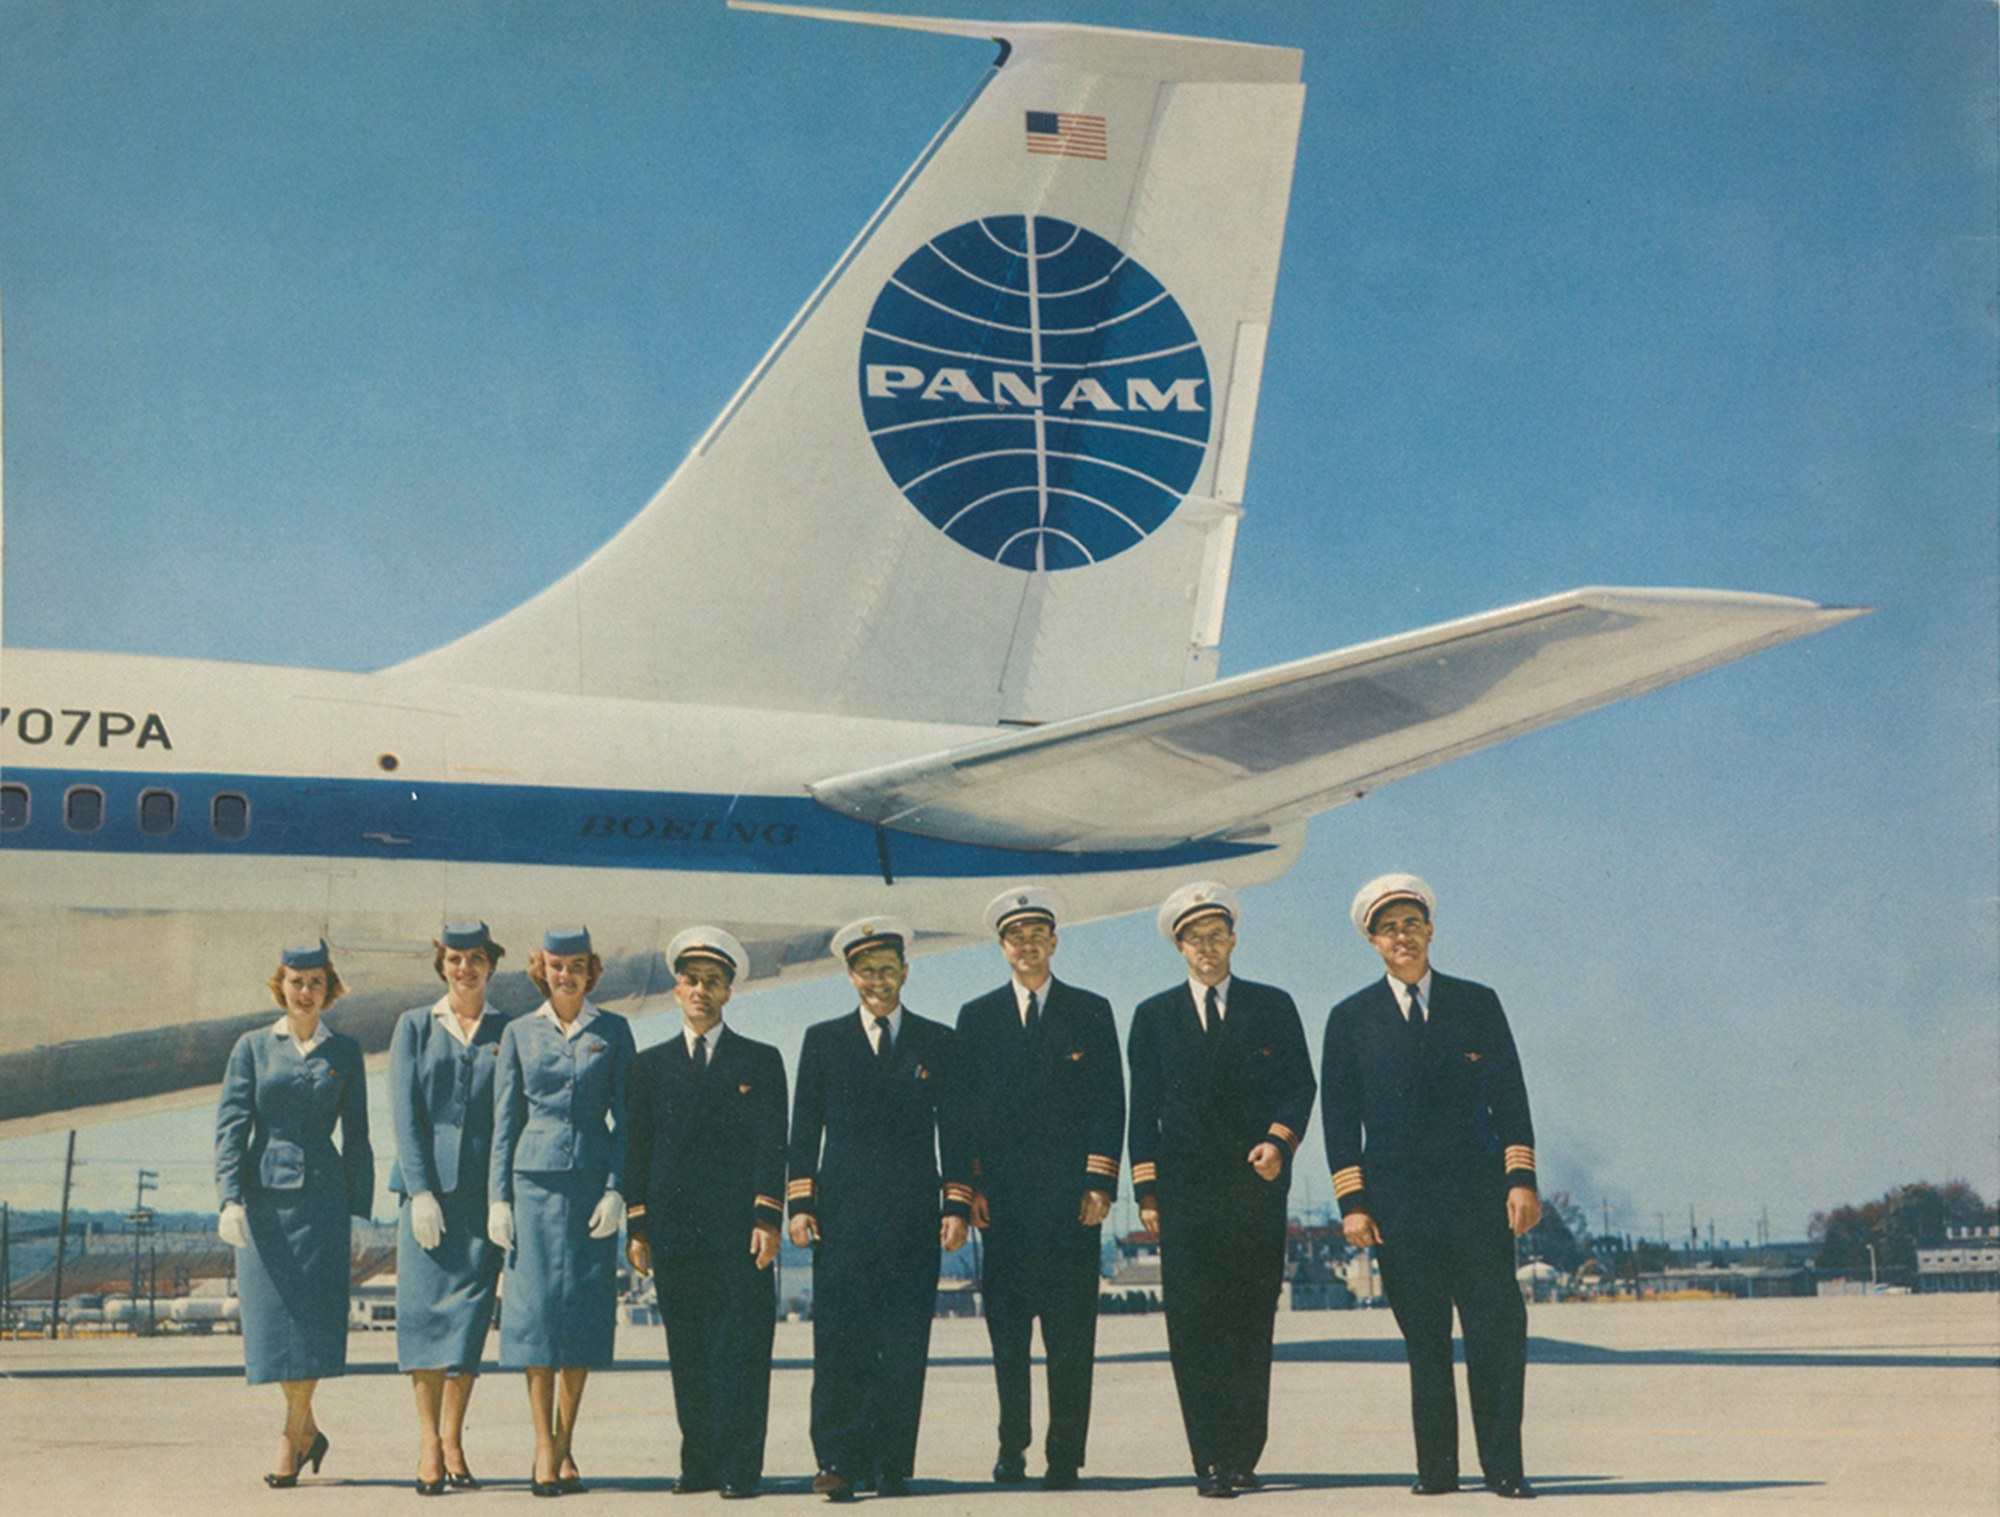 Vintage Airline travel posters Vintage cookbooks00002.jpg